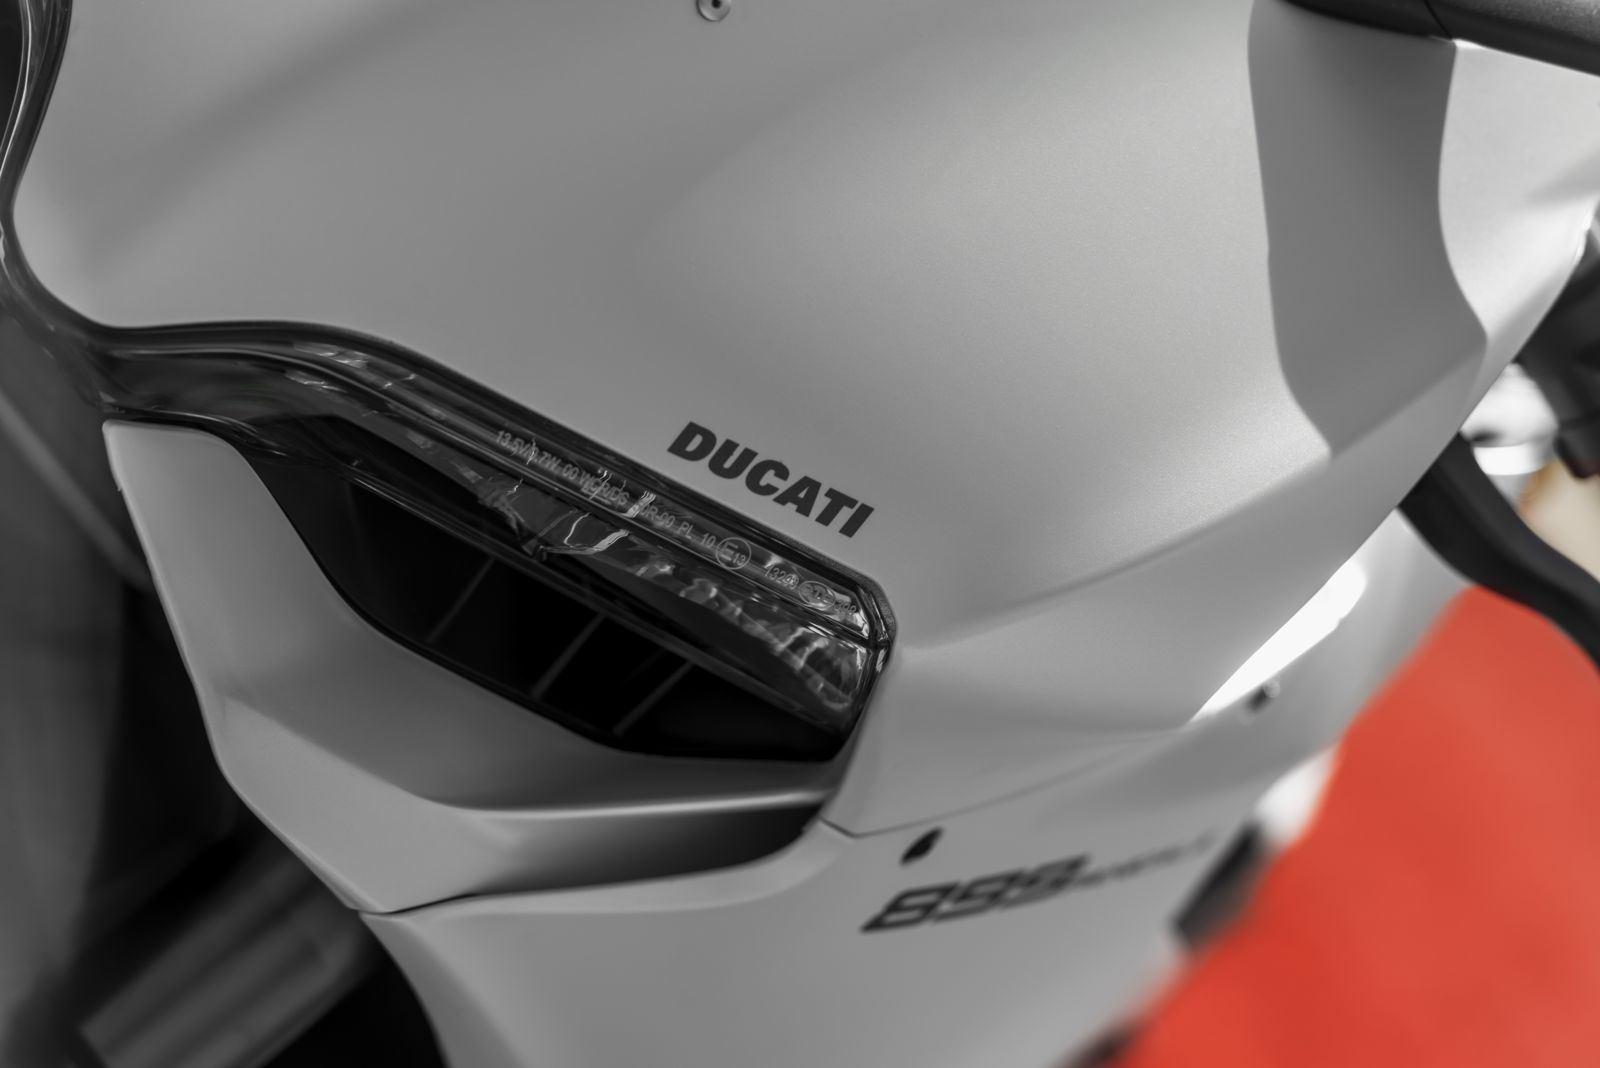 Ducati-899-Panigale-Newsbeitrag